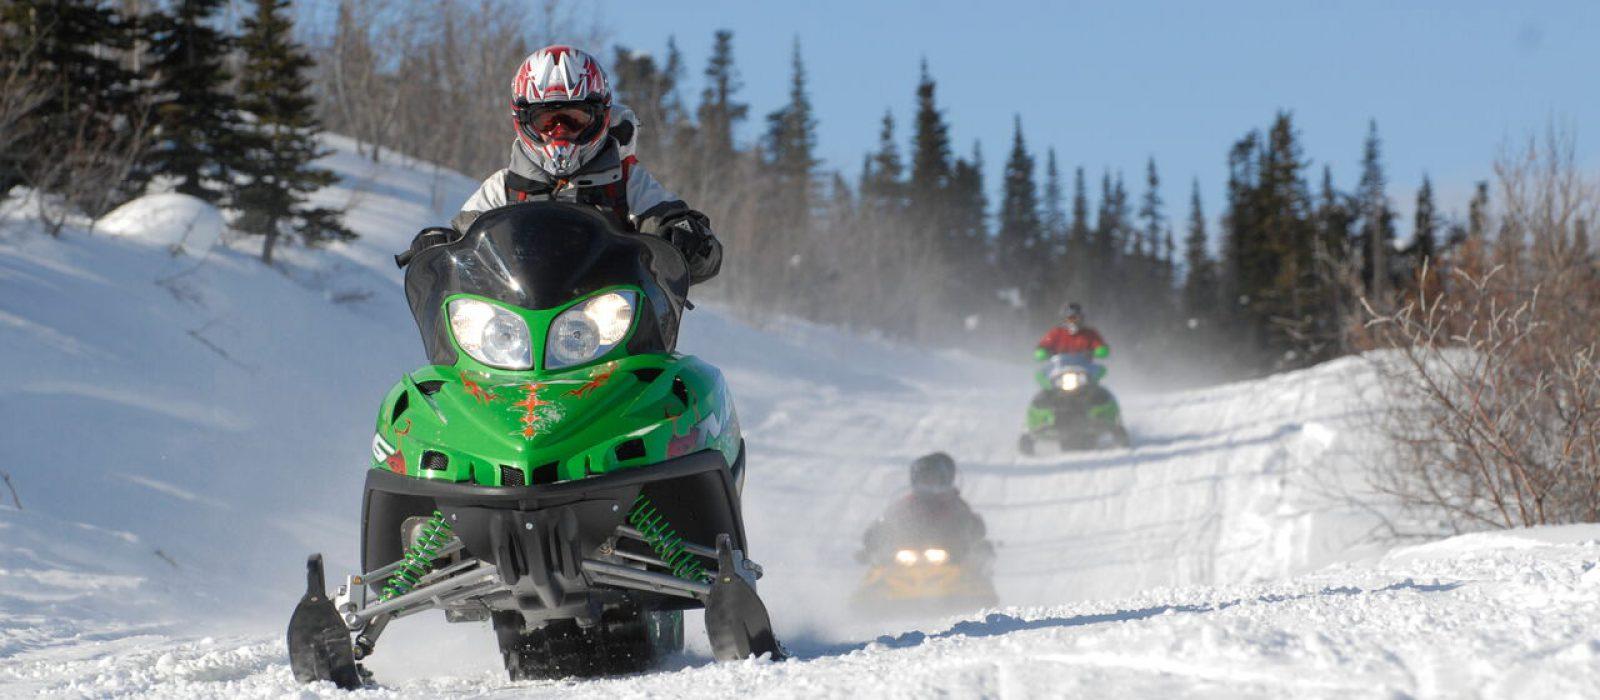 Snowmobiling in the Yukon, Canada.